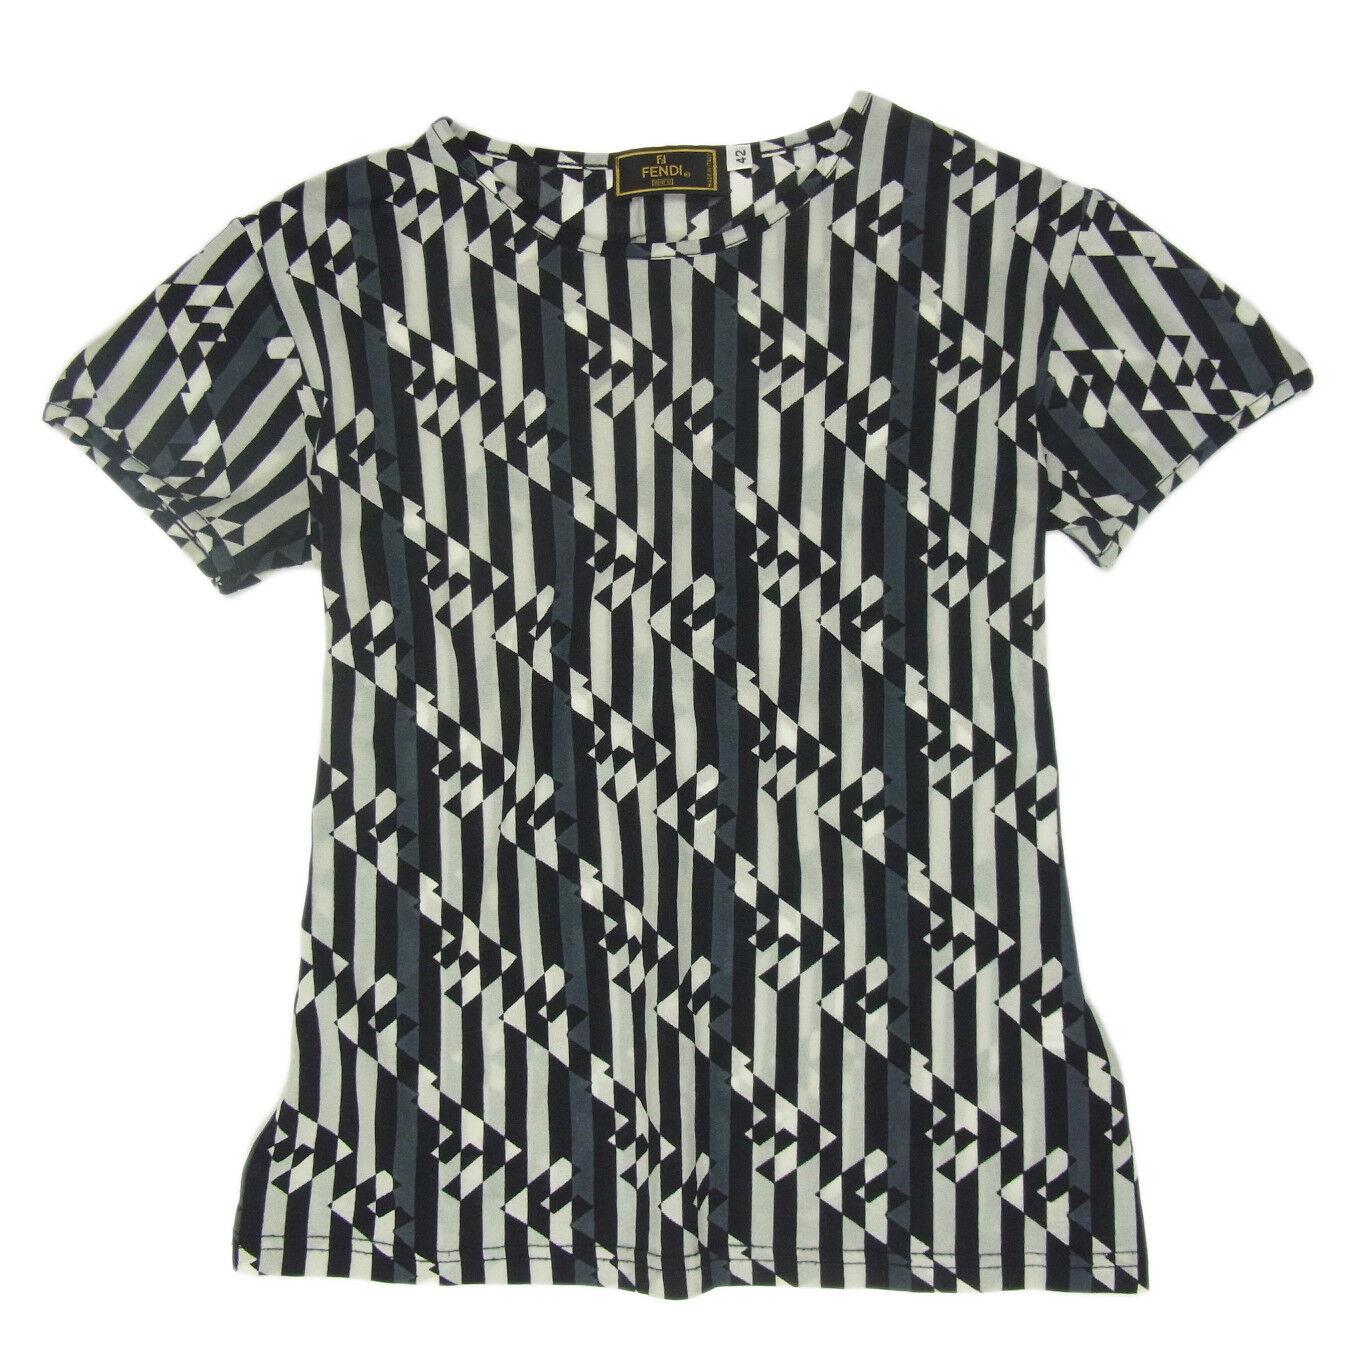 Auth FENDI Logos Stripe Pattern T Shirt Tops Sz 42 US M F S 2107